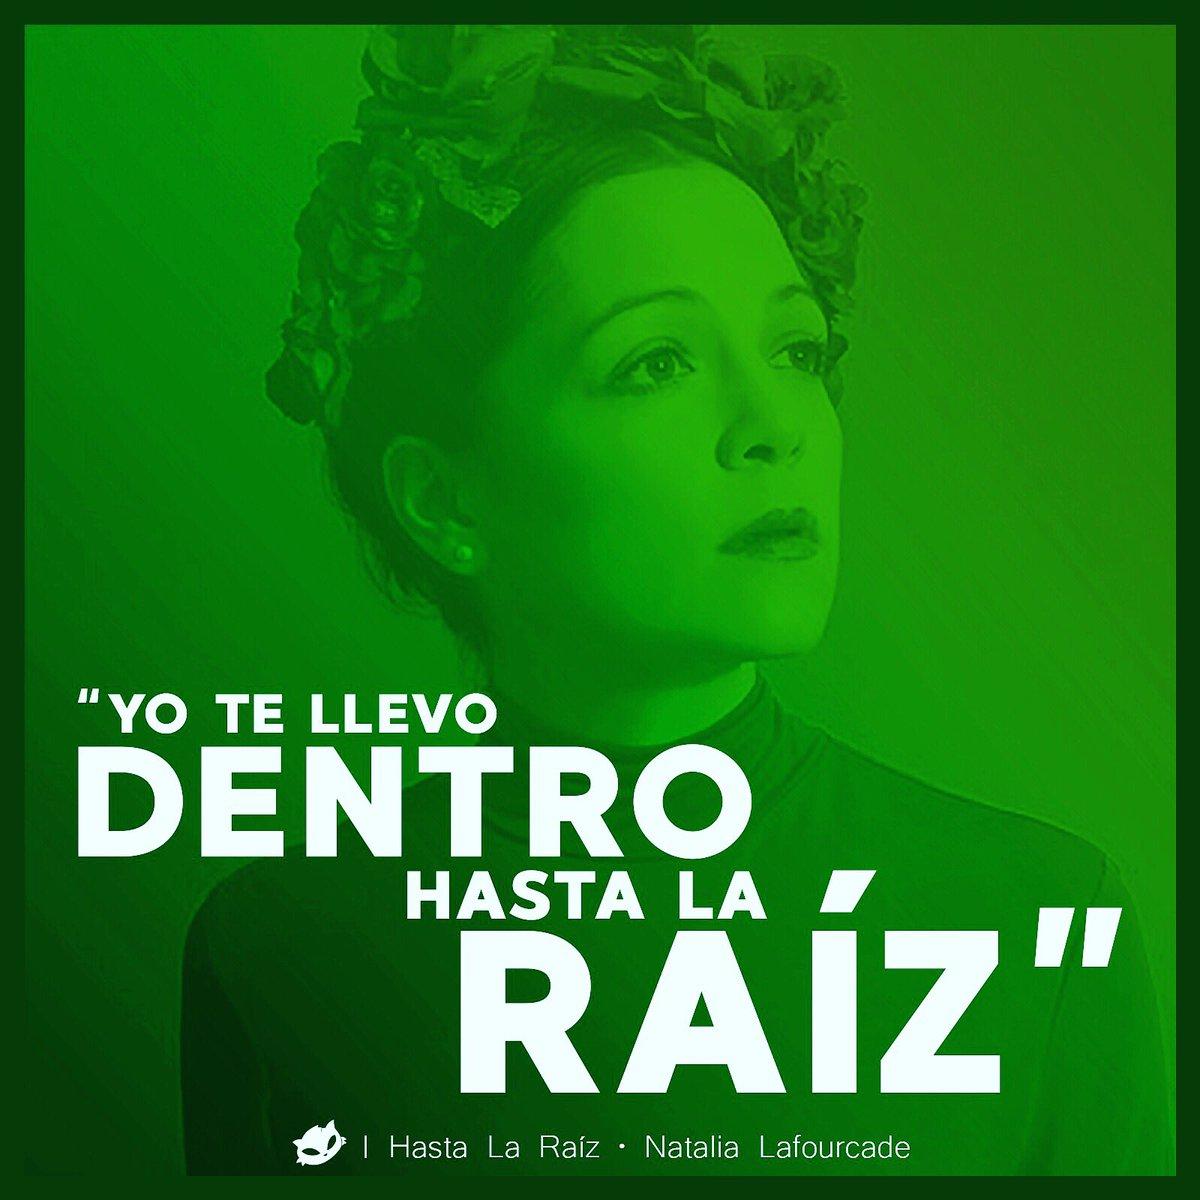 Cabeza De Pan در توییتر Frases Chidas 4 Yo Te Llevo